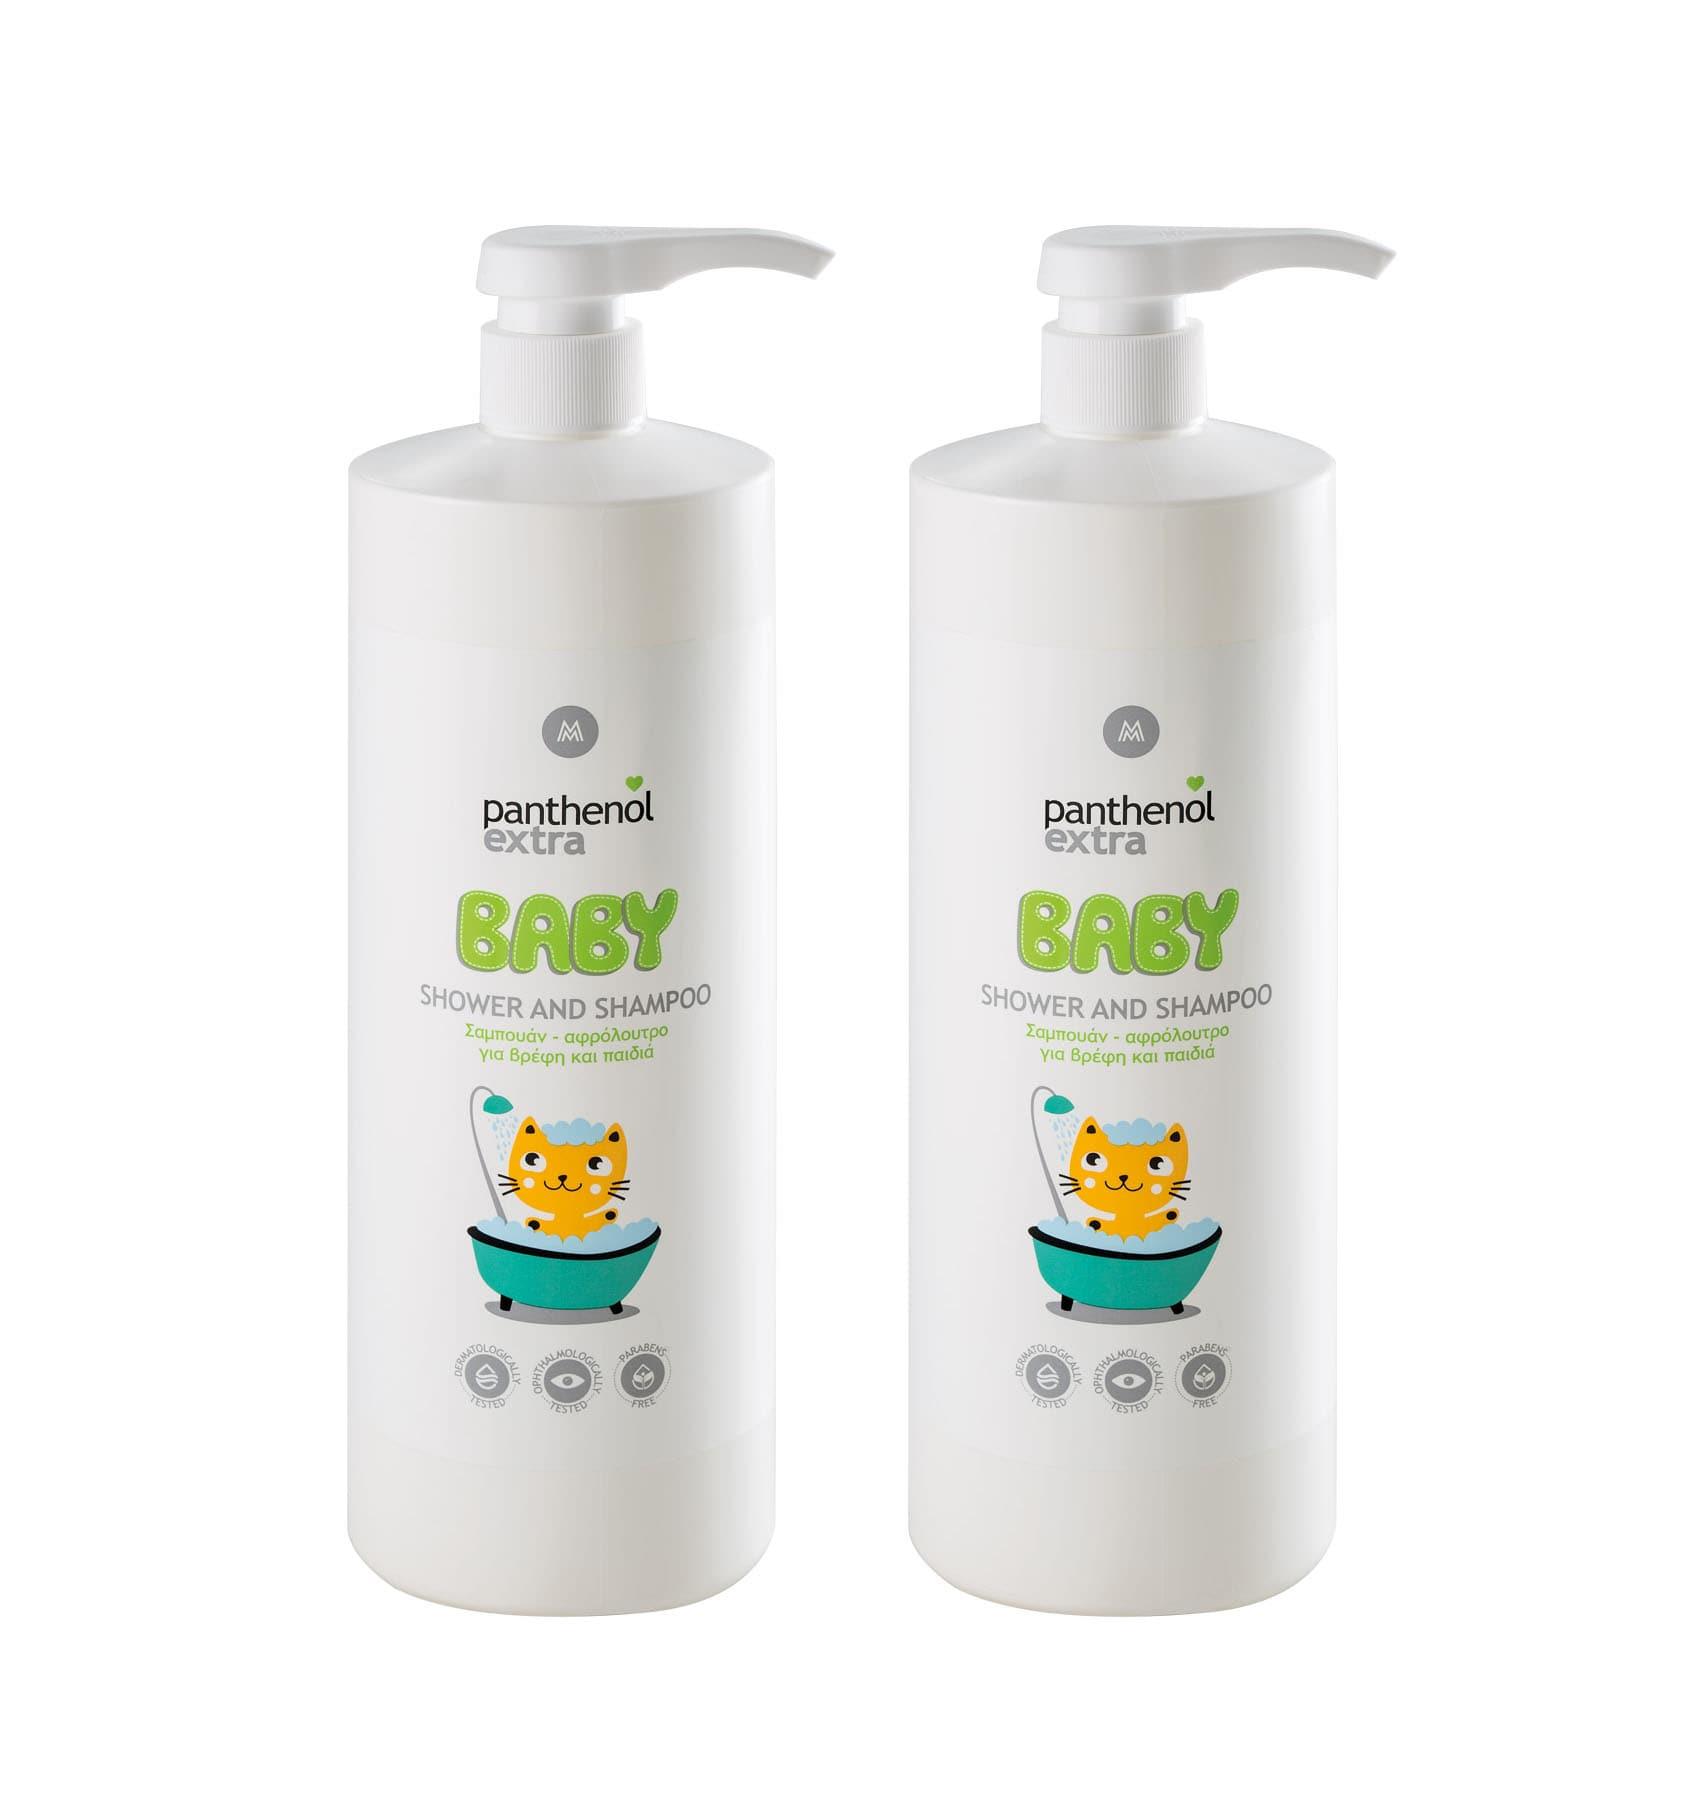 2 x Panthenol Extra Baby 2 in 1 Shampoo & Bath (1+1 ΔΩΡΟ) Σαμπουάν - Αφρόλουτρο για βρέφη & παιδιά, 2 x 1lt